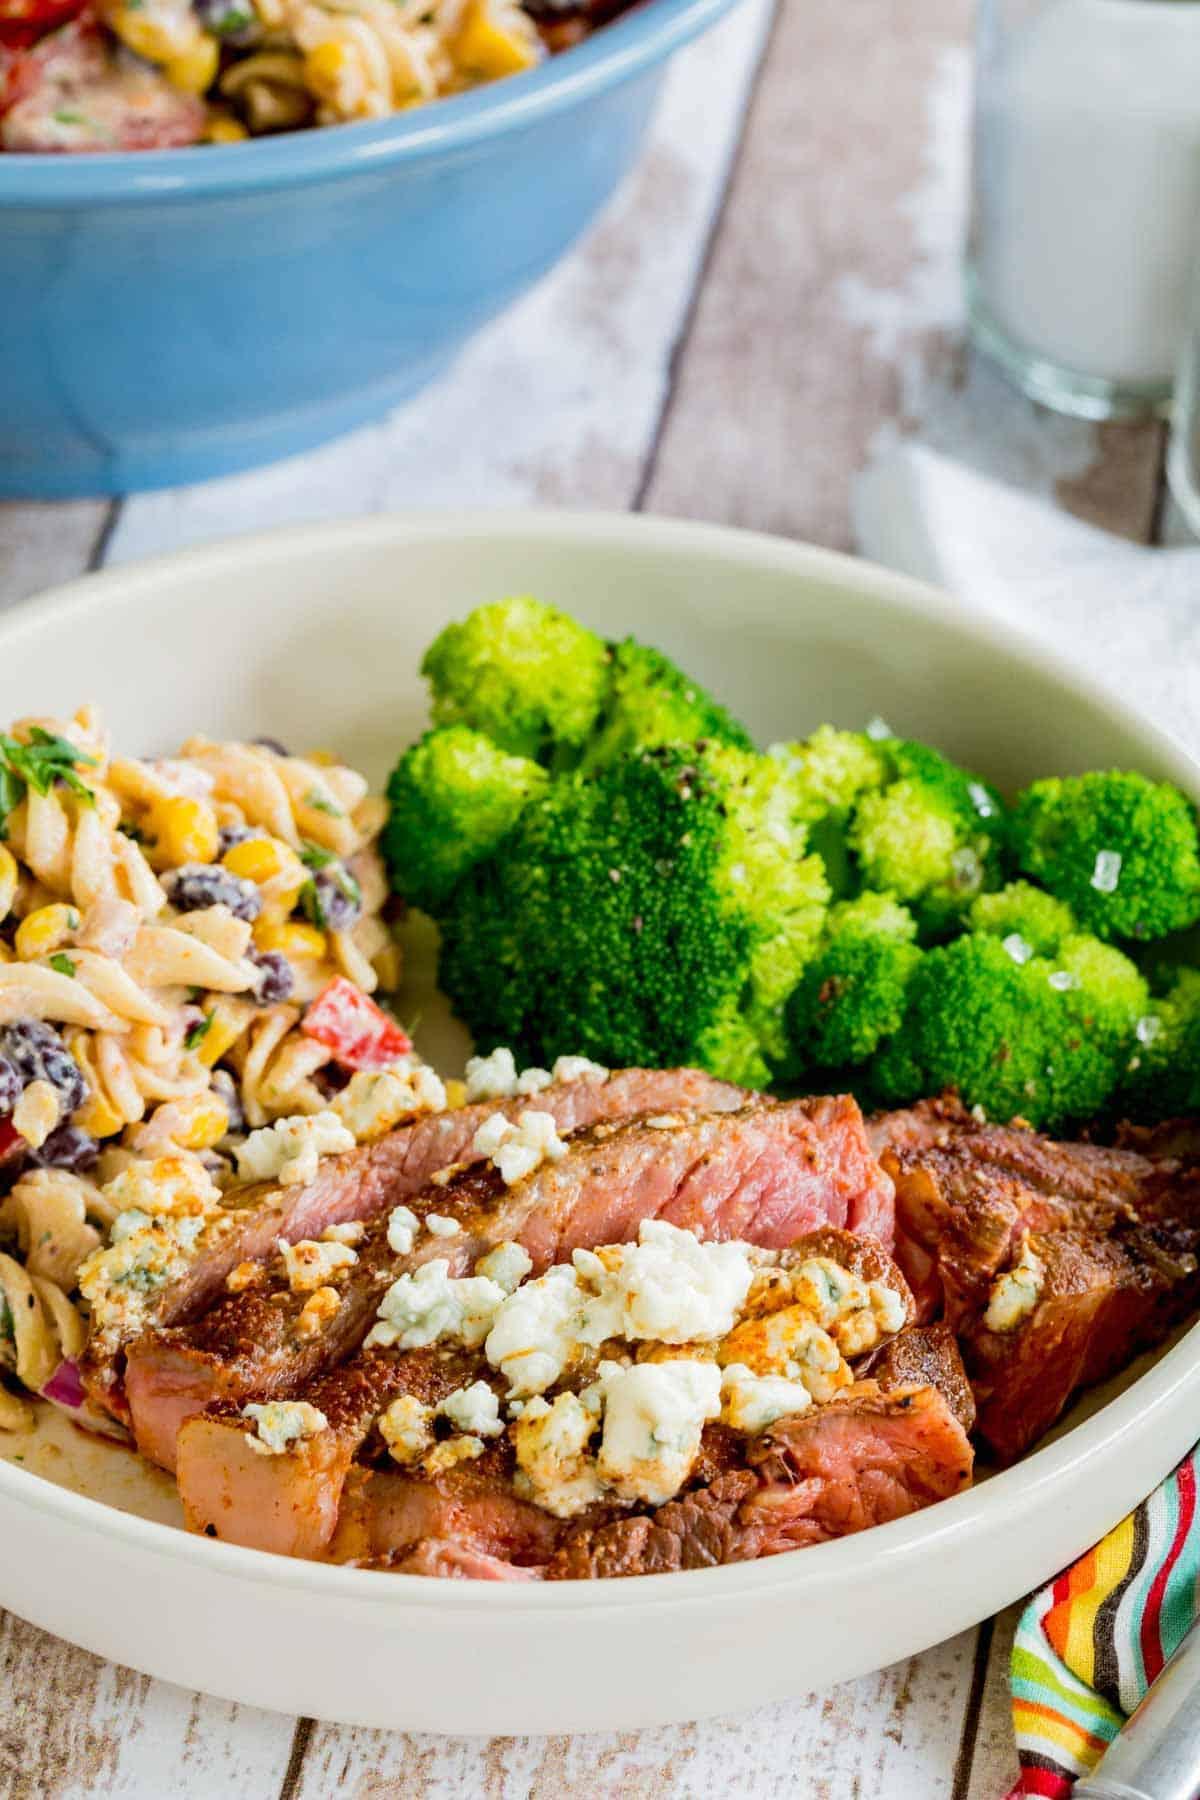 A Plate of Black and Blue Steak, Broccoli and Macaroni Salad